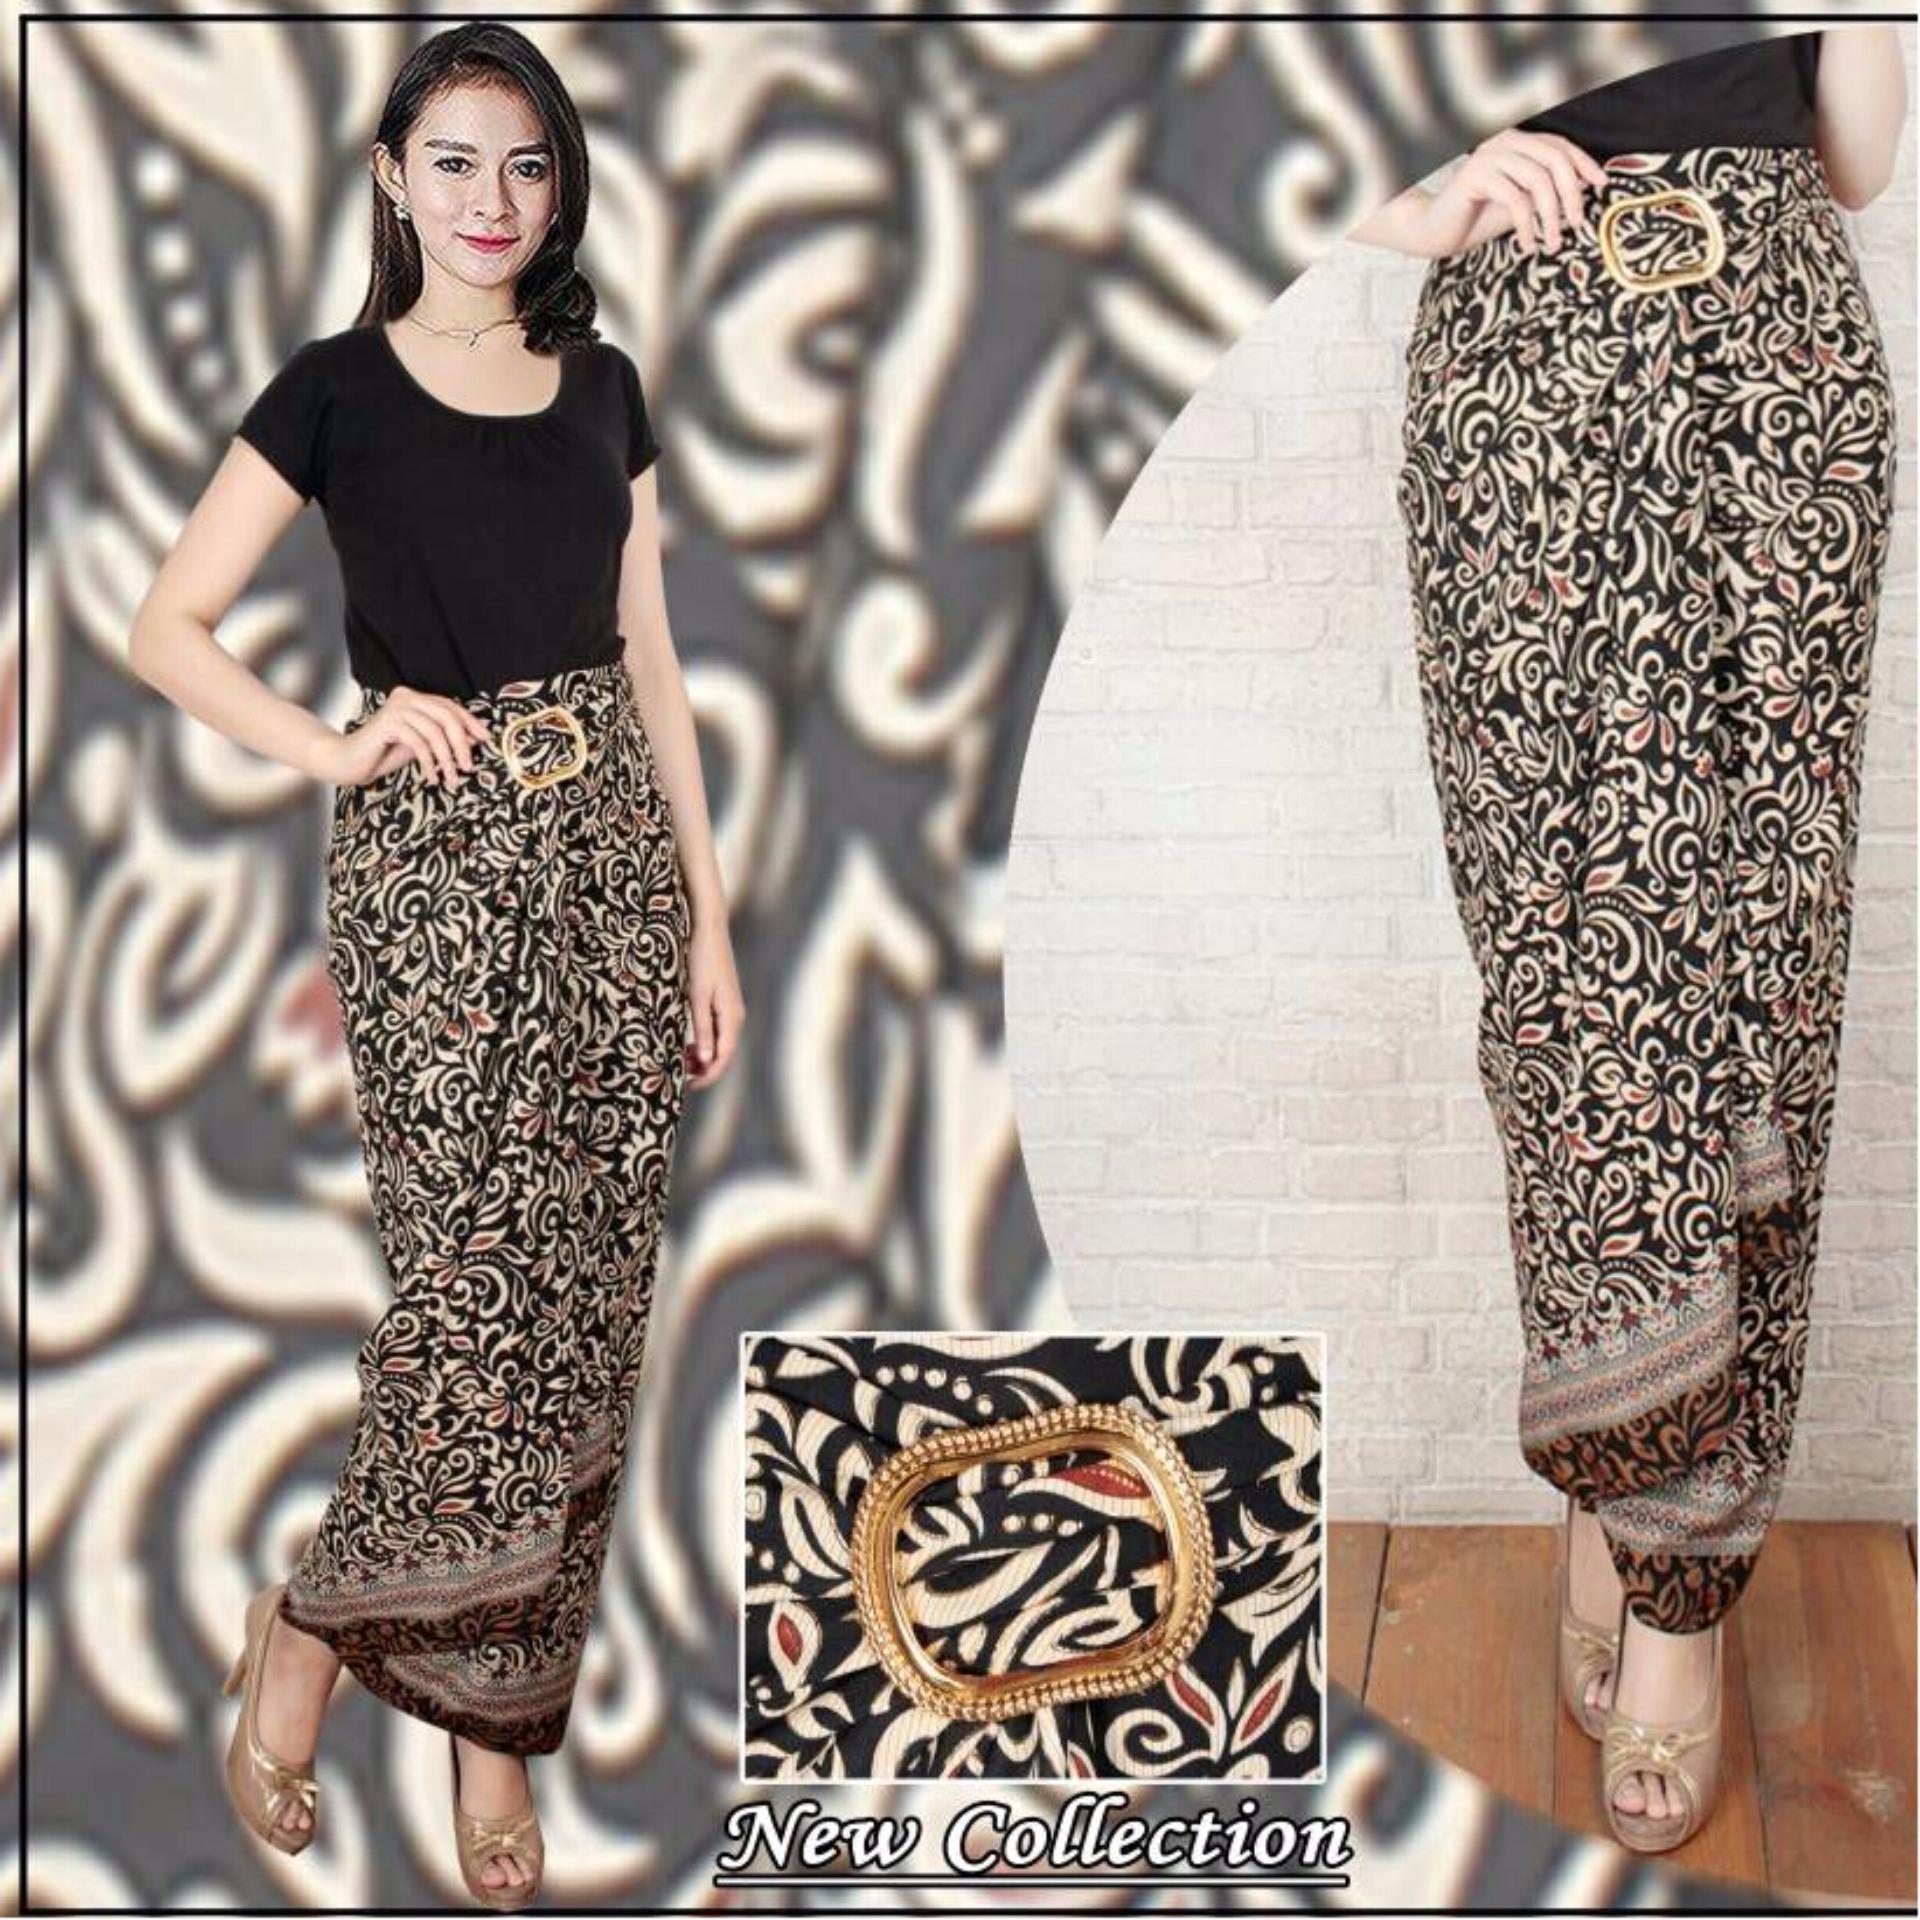 Store Info Terbaru Promo Harga Berbagai Produk Terlaris Kulot Midi Nda Fjn822b Free Ring Rok Lilit Batik Wanita Jumbo Long Skirt Flowery